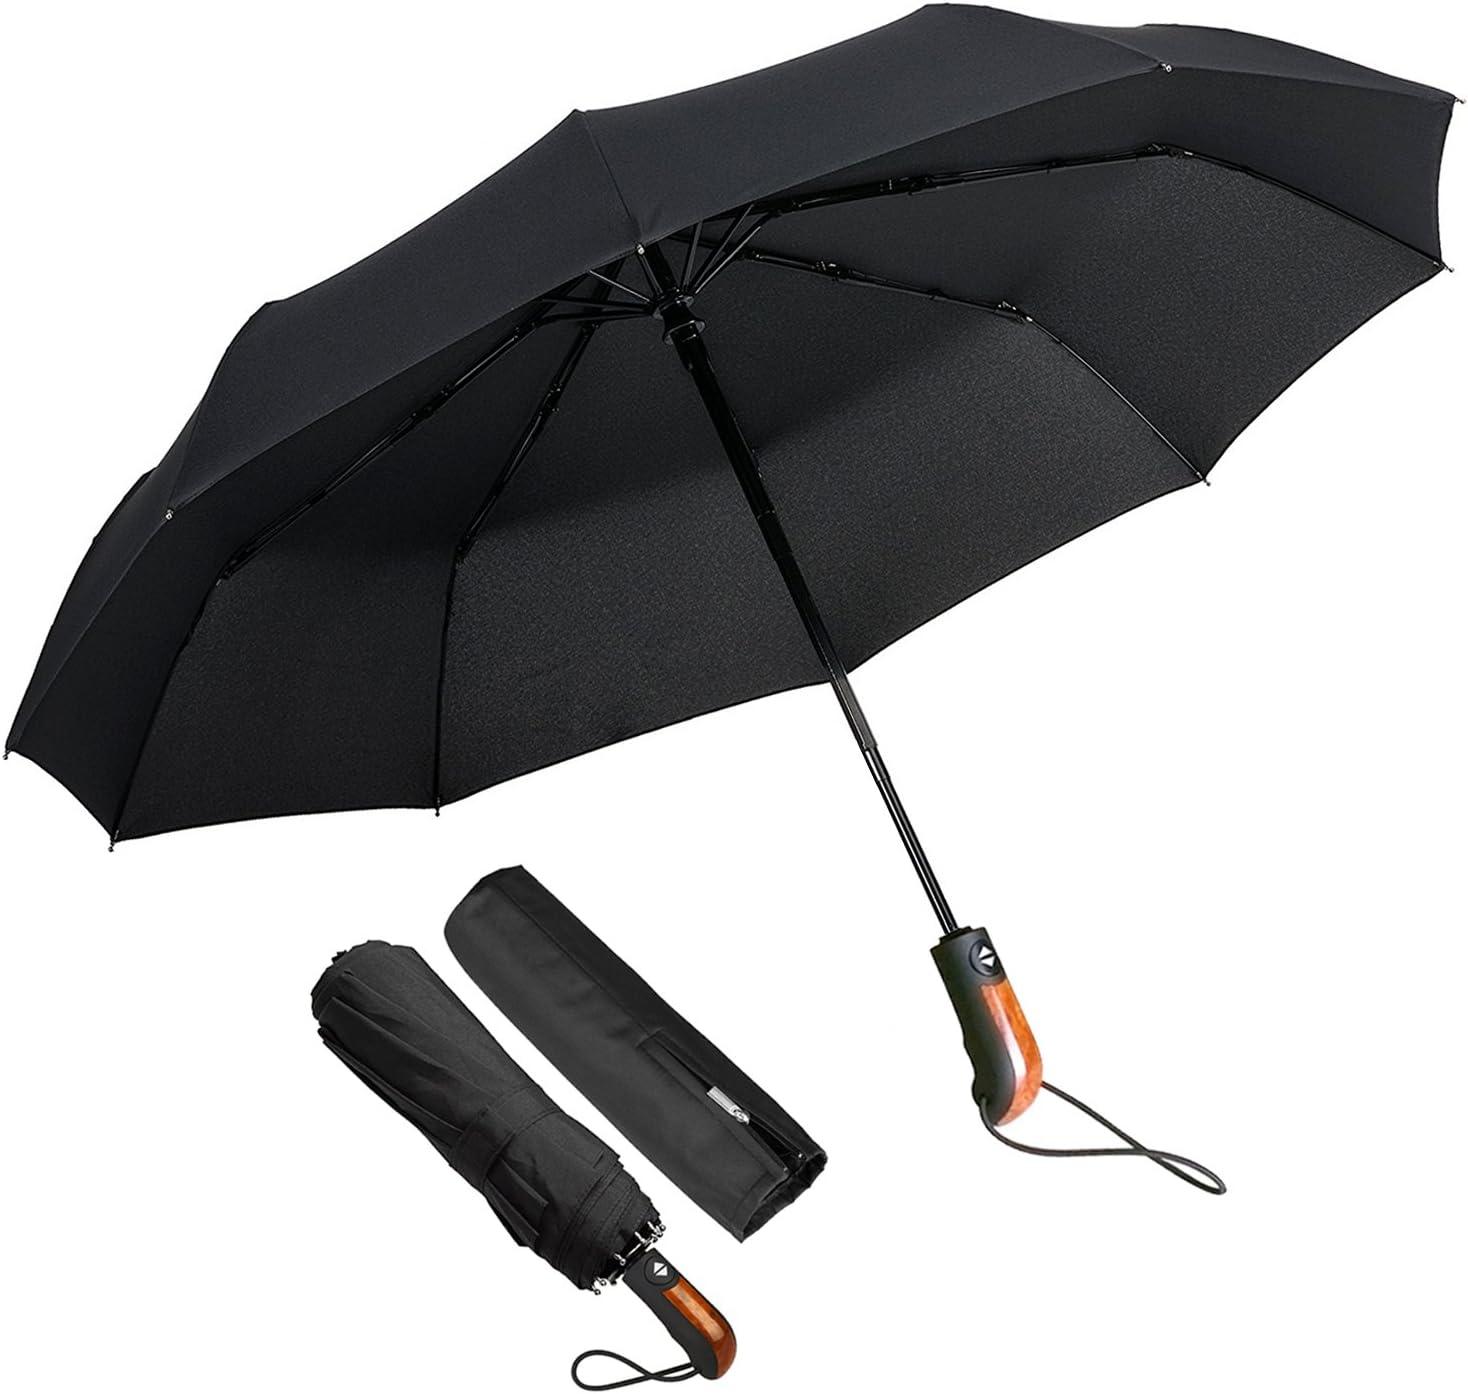 ECHOICE Paraguas plegable portátil ligero compacto a prueba de viento con tapa X-Grand Negro